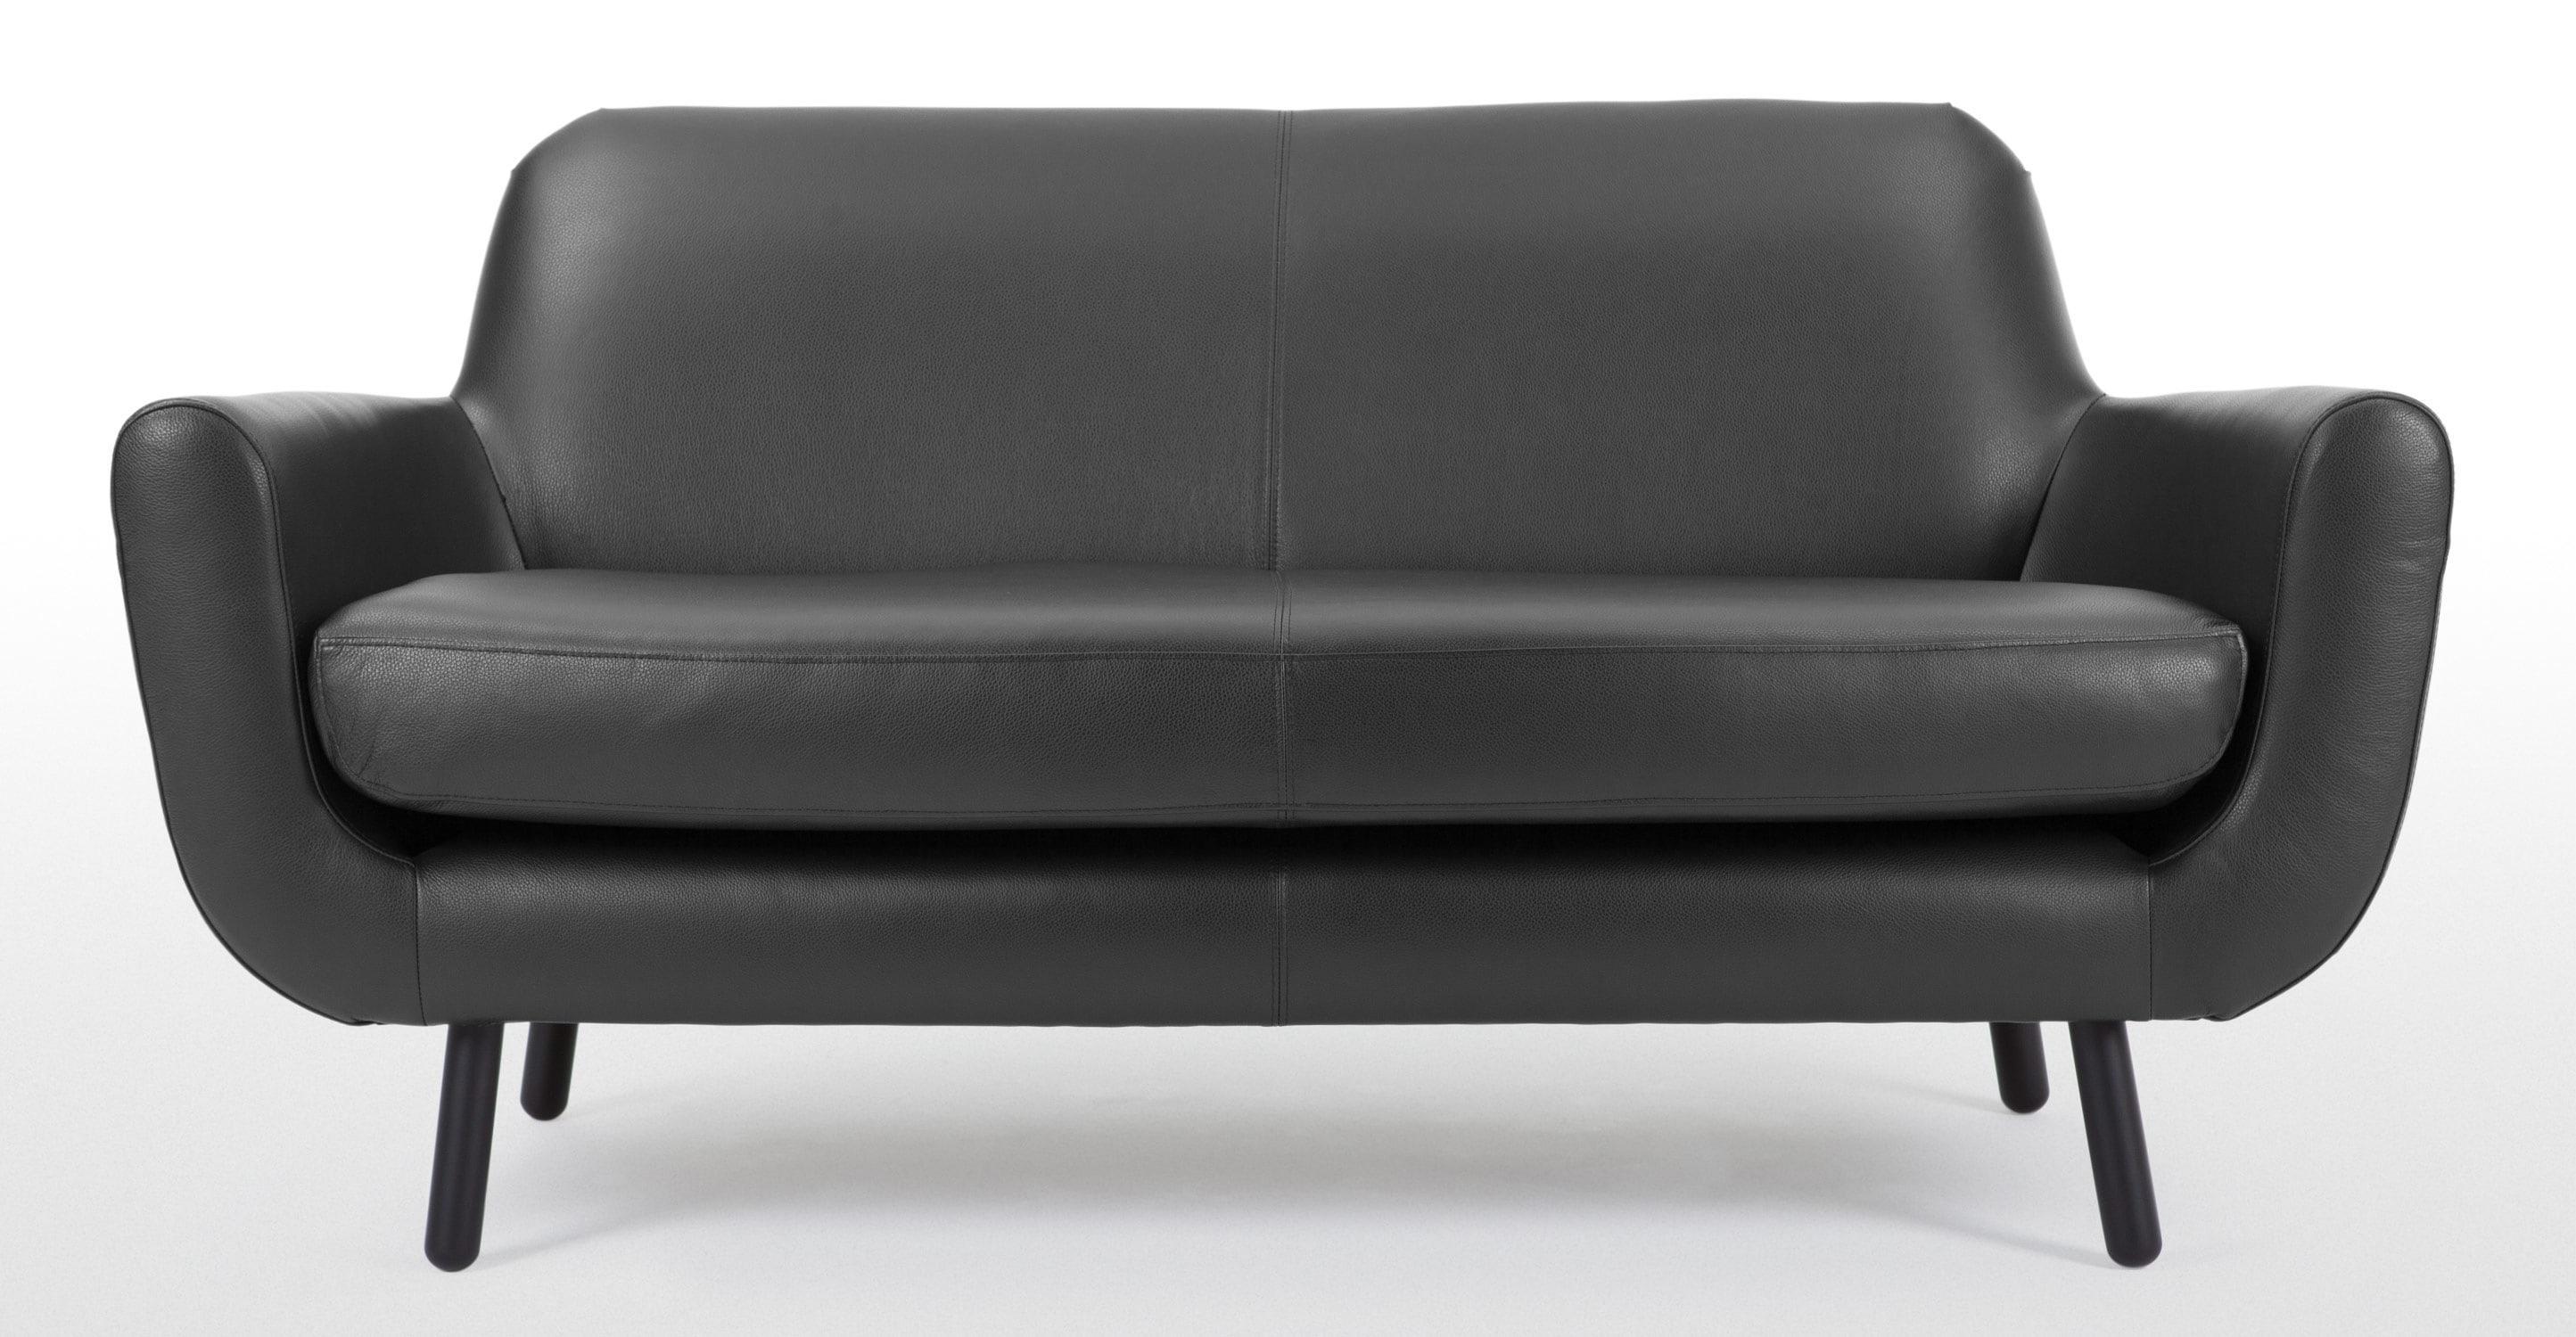 Jonah 2 Seater Sofa In Liquorice Black Premium Leather | Made for Black 2 Seater Sofas